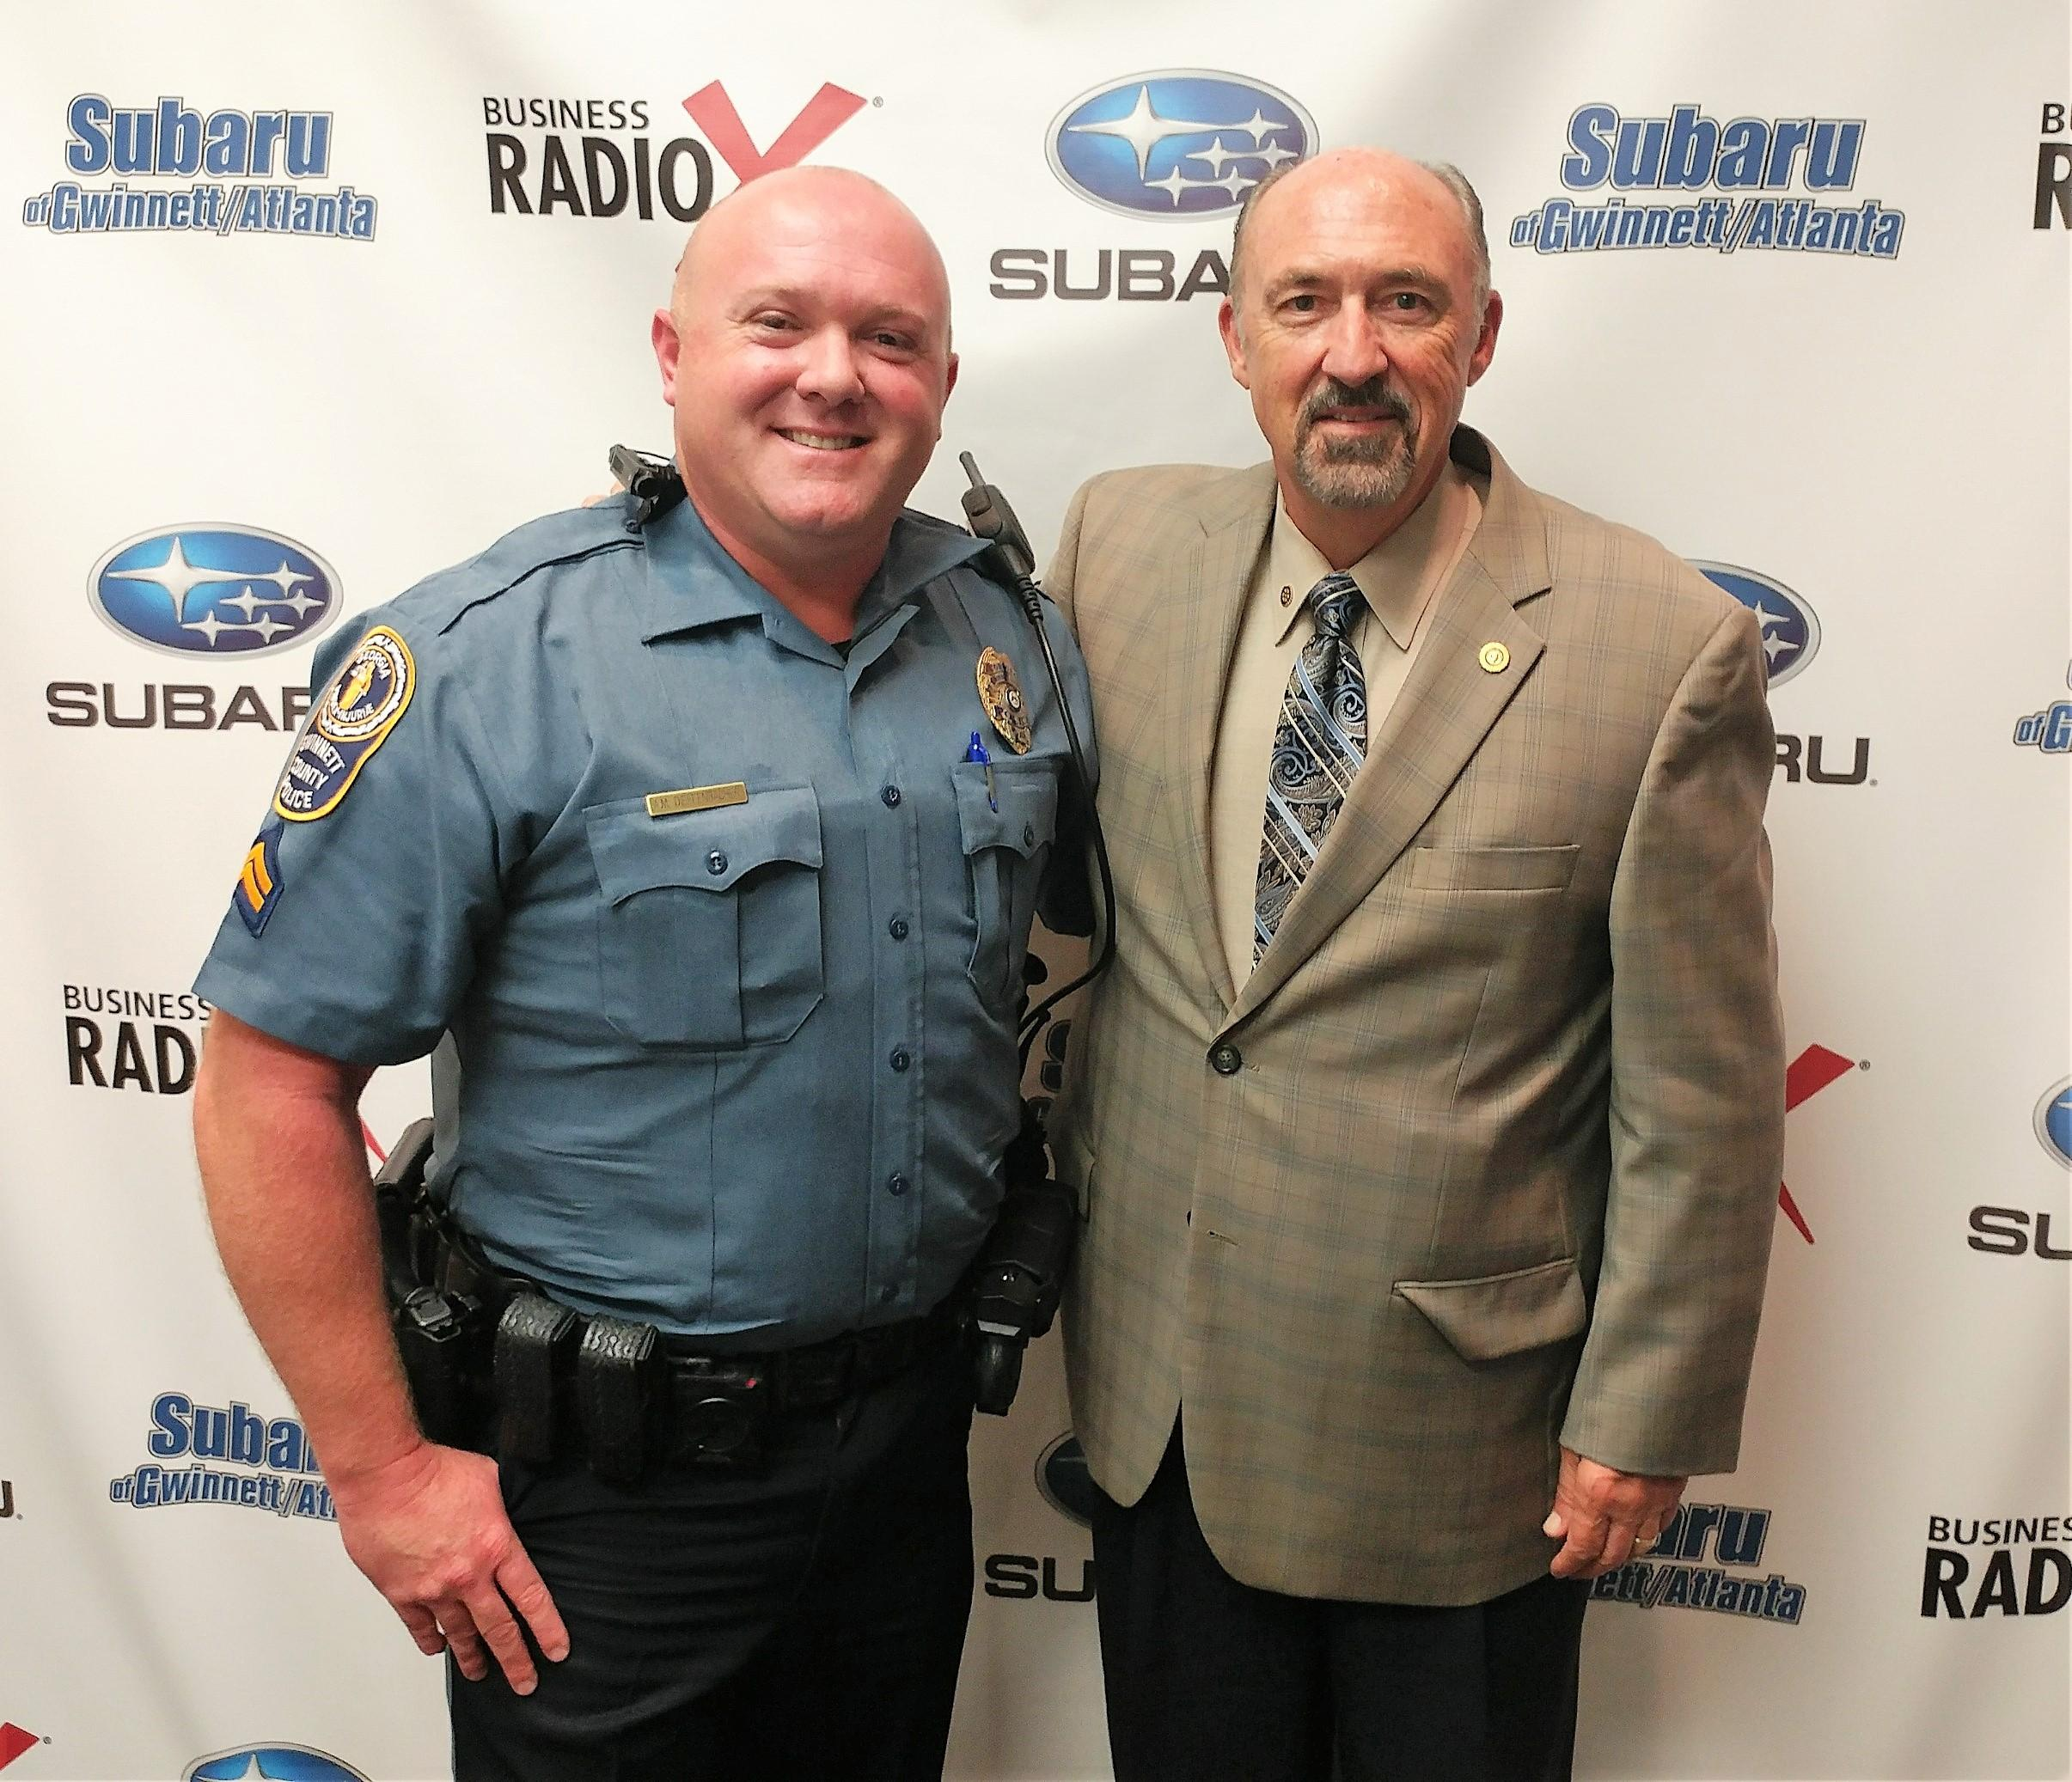 Aaren Dieffenbacher with the Gwinnett County Police